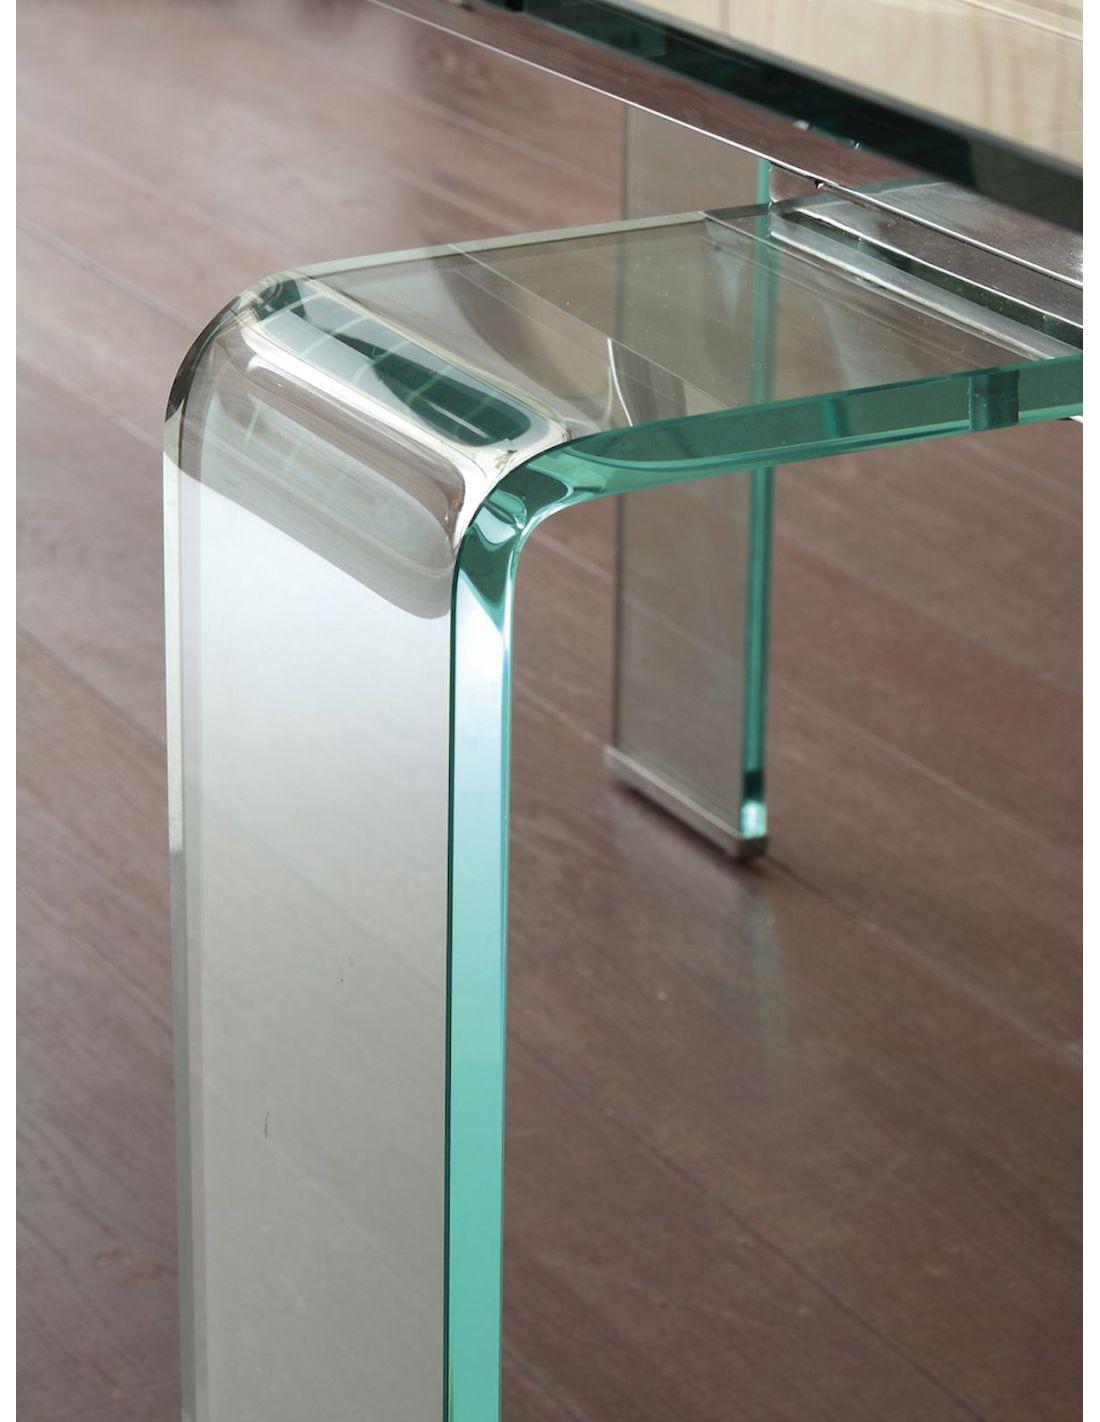 Tavolo allungabile evident mini in vetro trasparente e metallo for Tavolo allungabile vetro trasparente